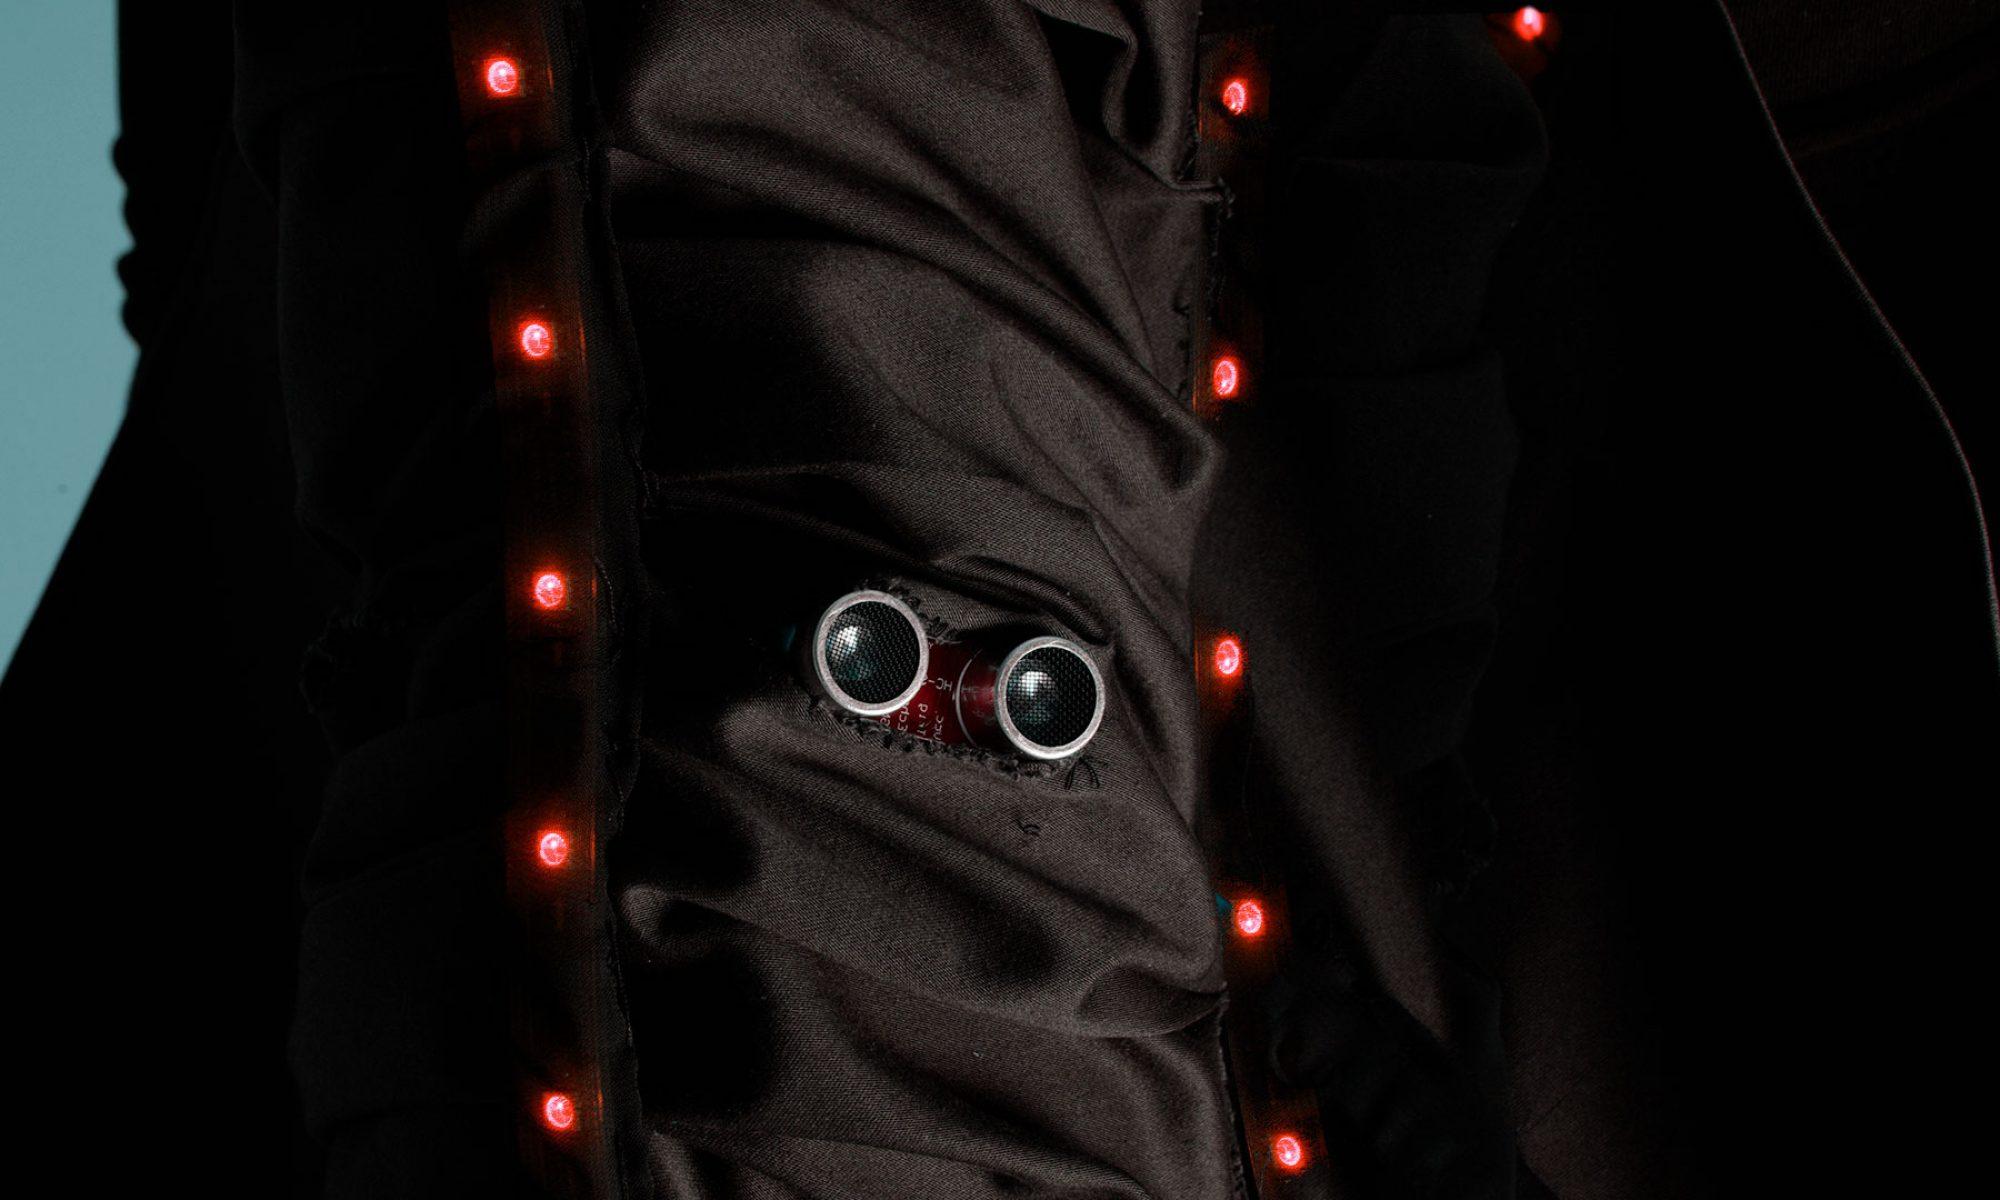 Costumes and Sensors